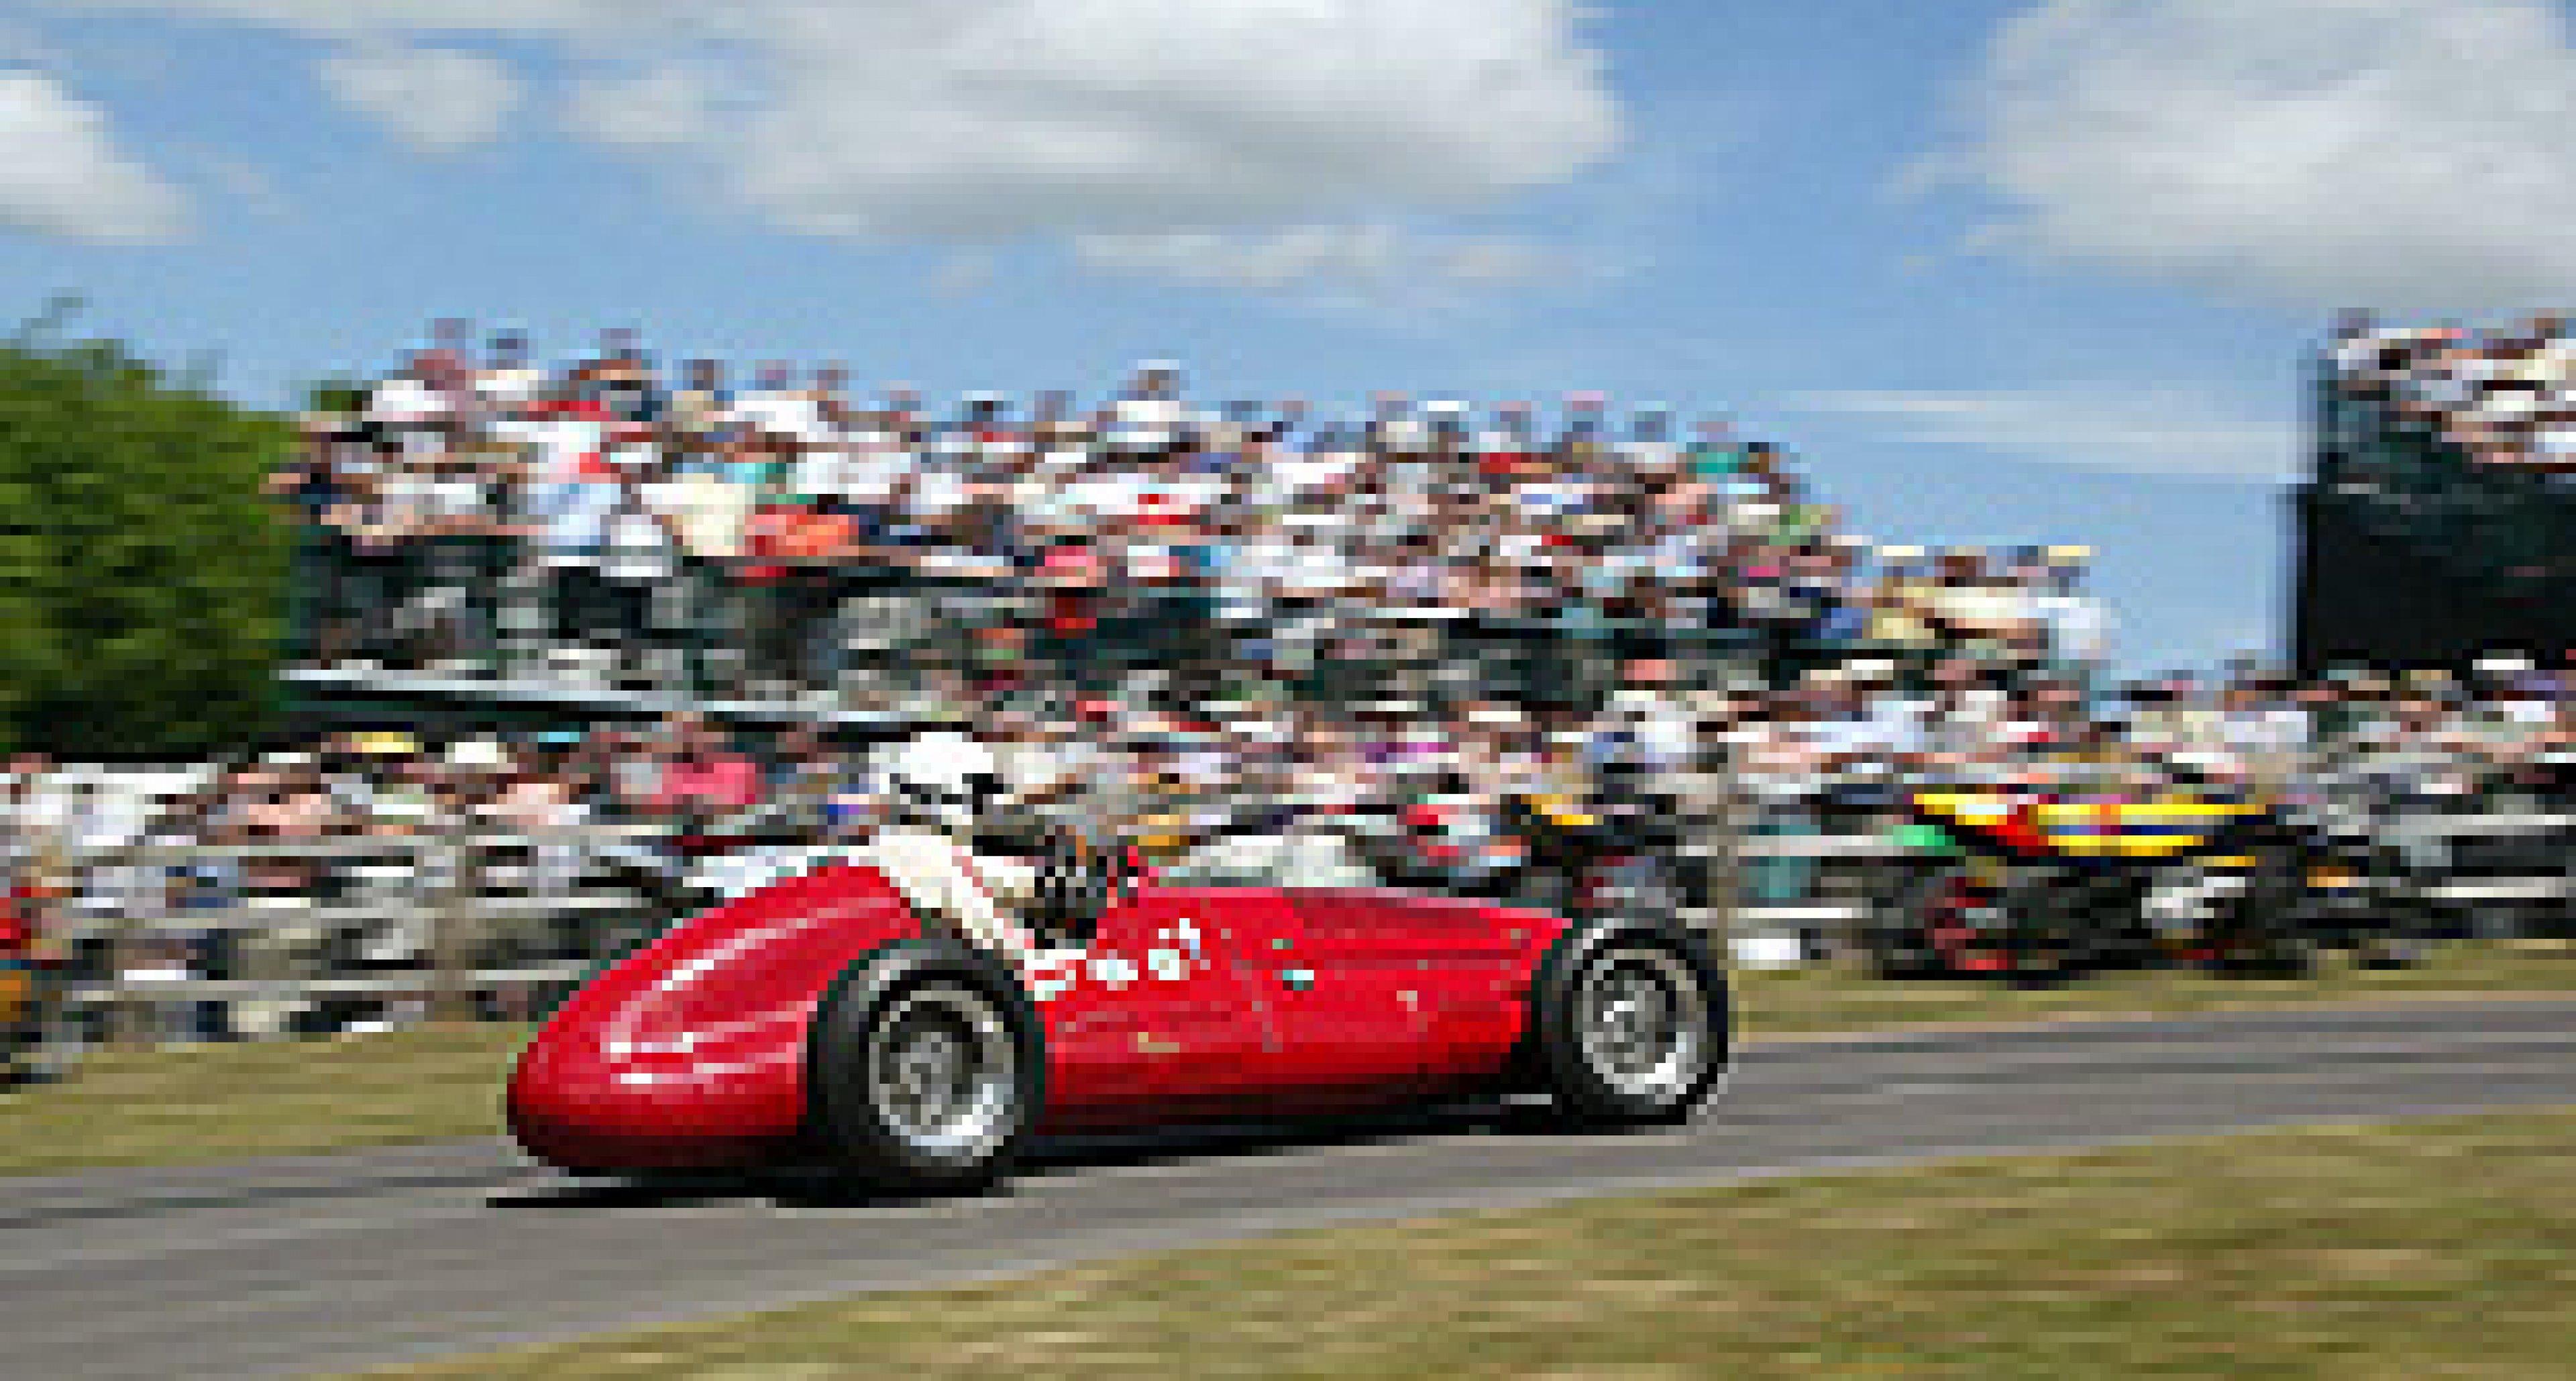 Goodwood Festival of Speed 2011: Thema steht fest